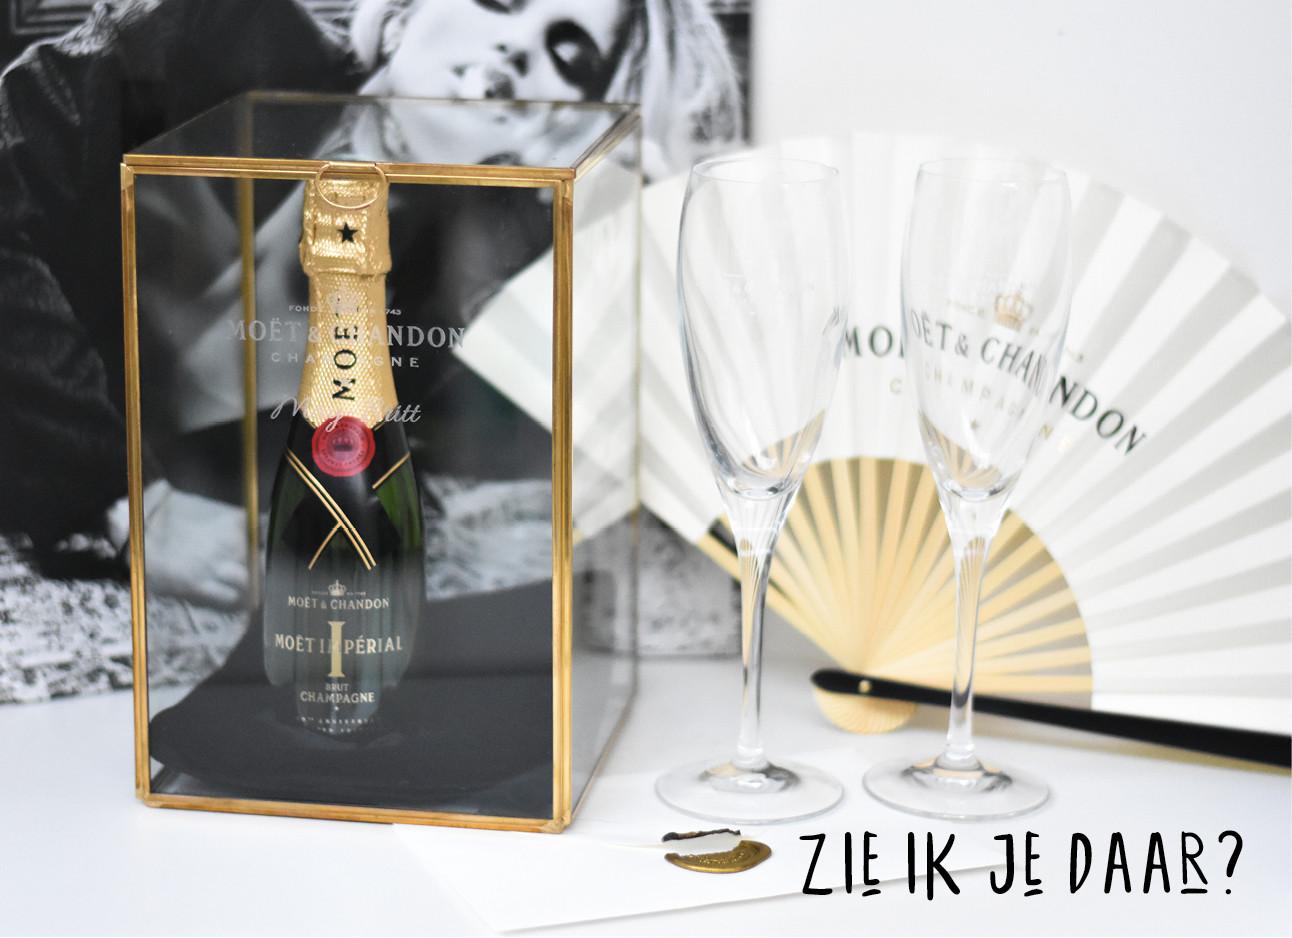 moet champagne uitnodigign